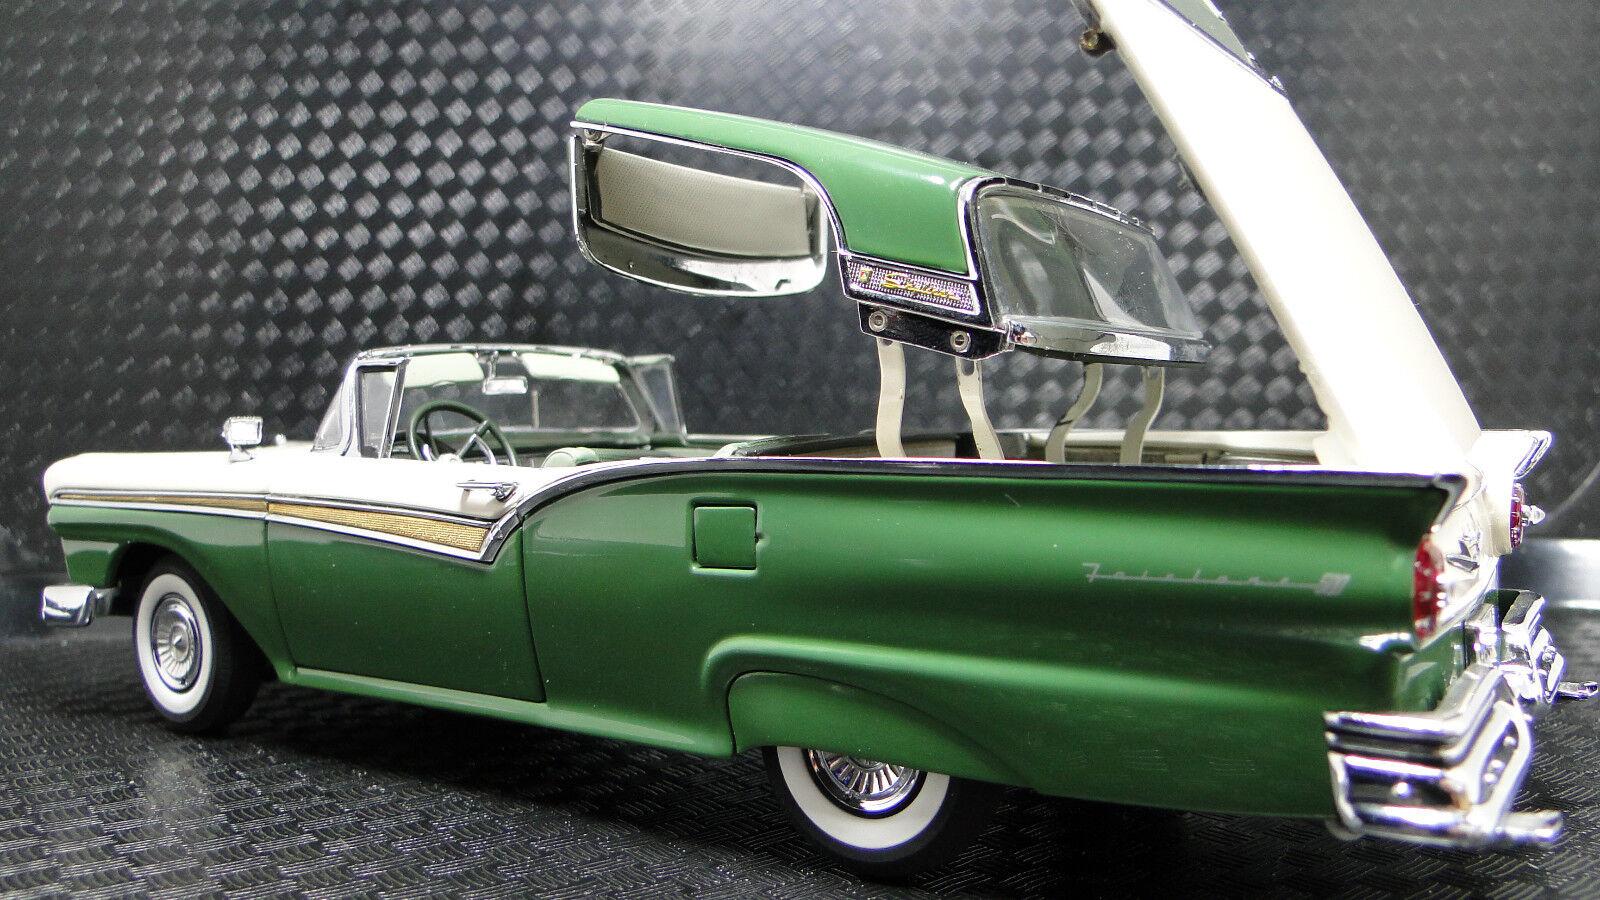 Un Ford construido 1 1950s Gt Auto 12 Vintage T antiguos 18 Modelo 25 Classic 24 Metal 40